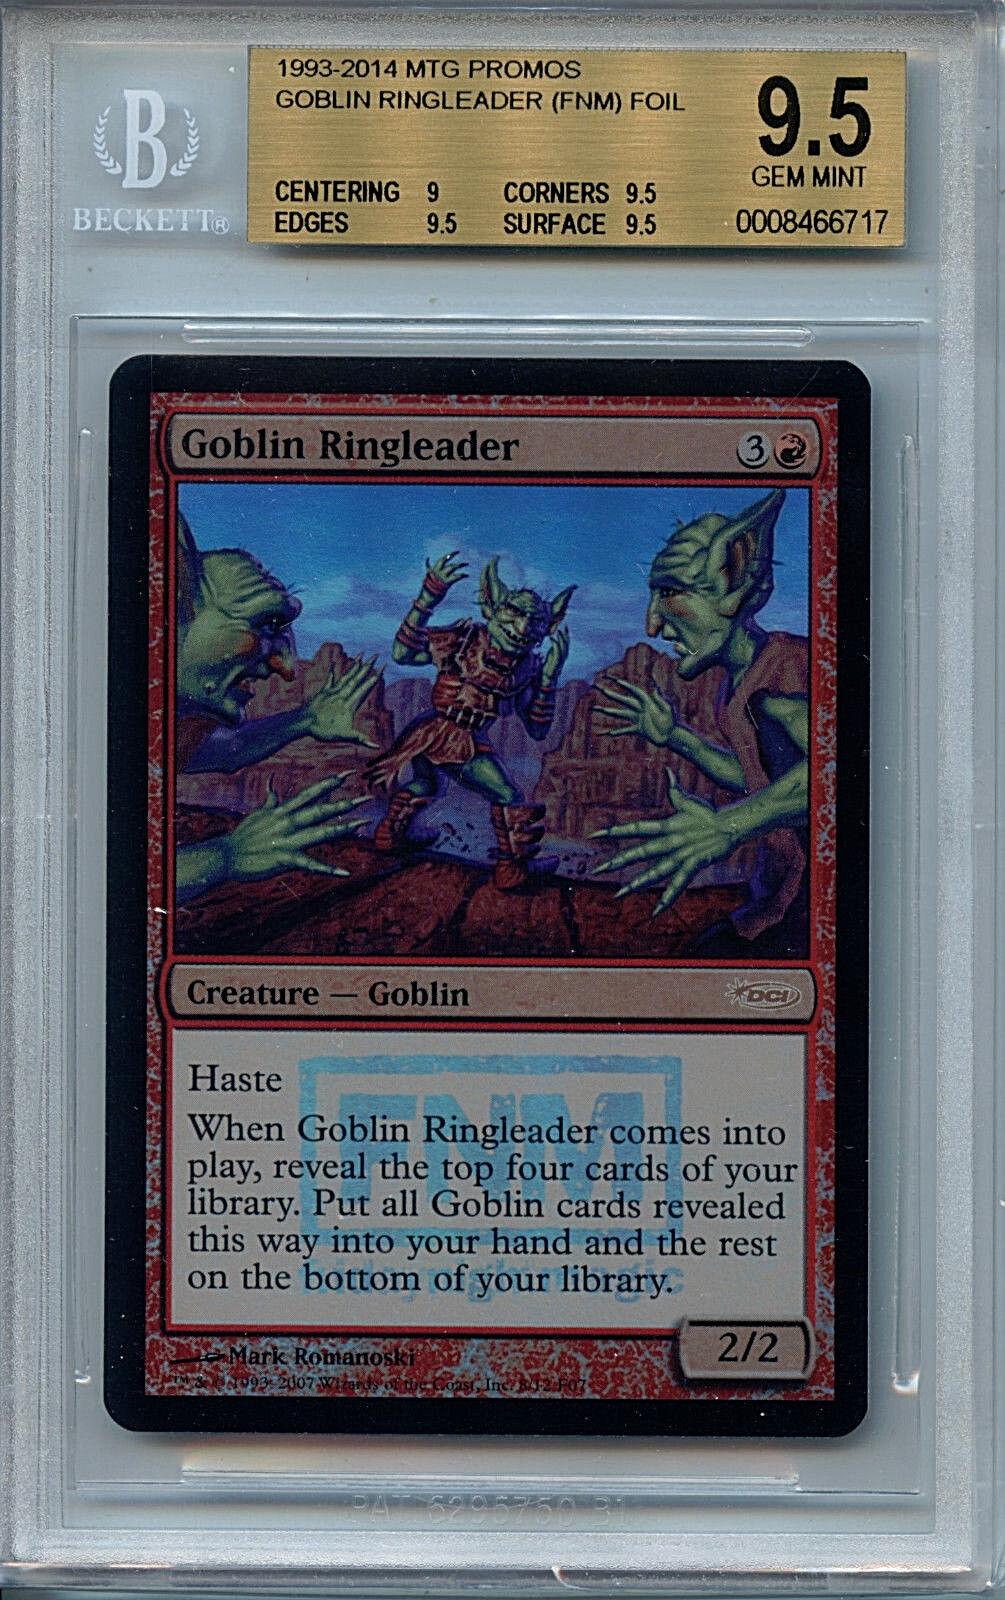 Mtg goblin - anfhrer bgs 9,5 mtg fnm promos magie folie karte amricons 6717